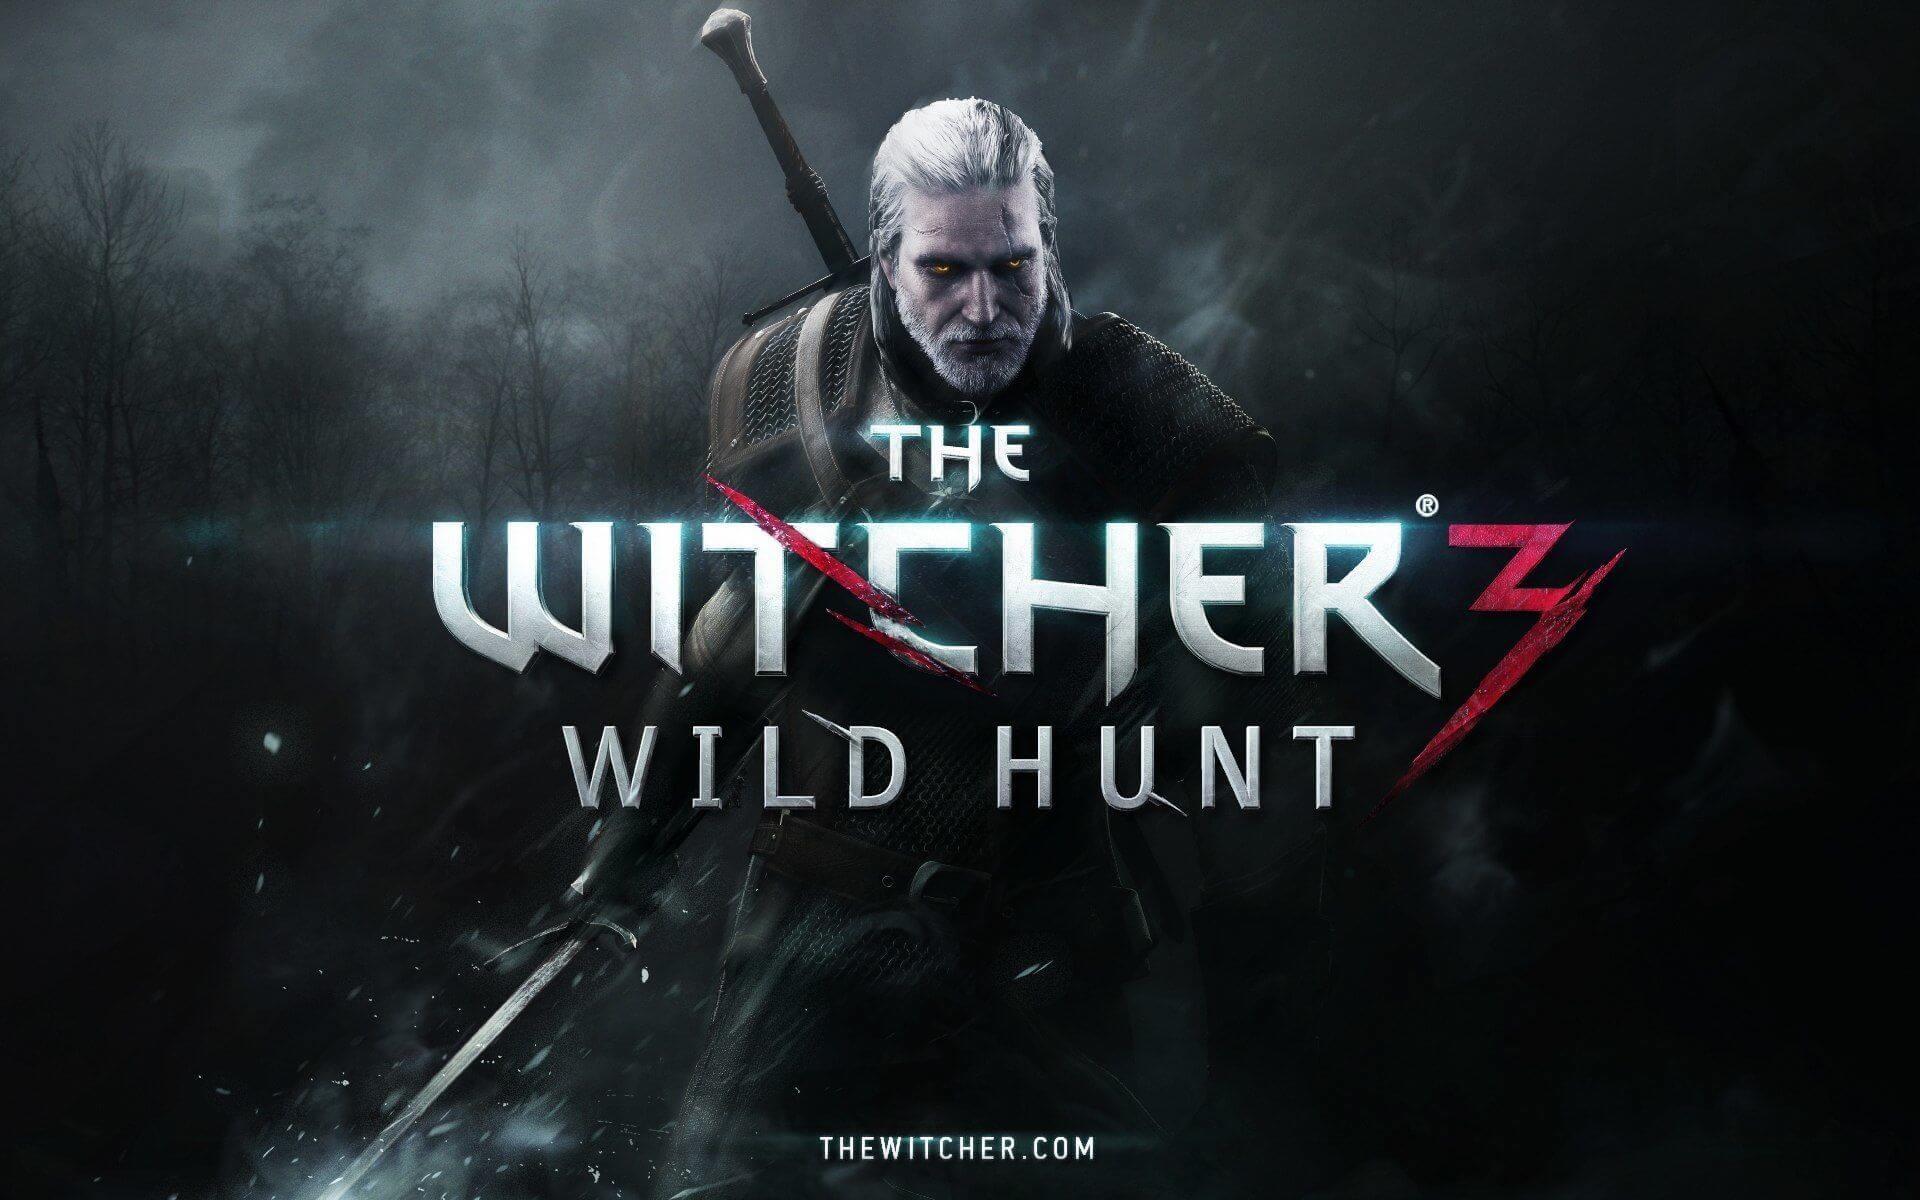 … The Witcher 3 Wild Hunt Geralt Wallpaper …